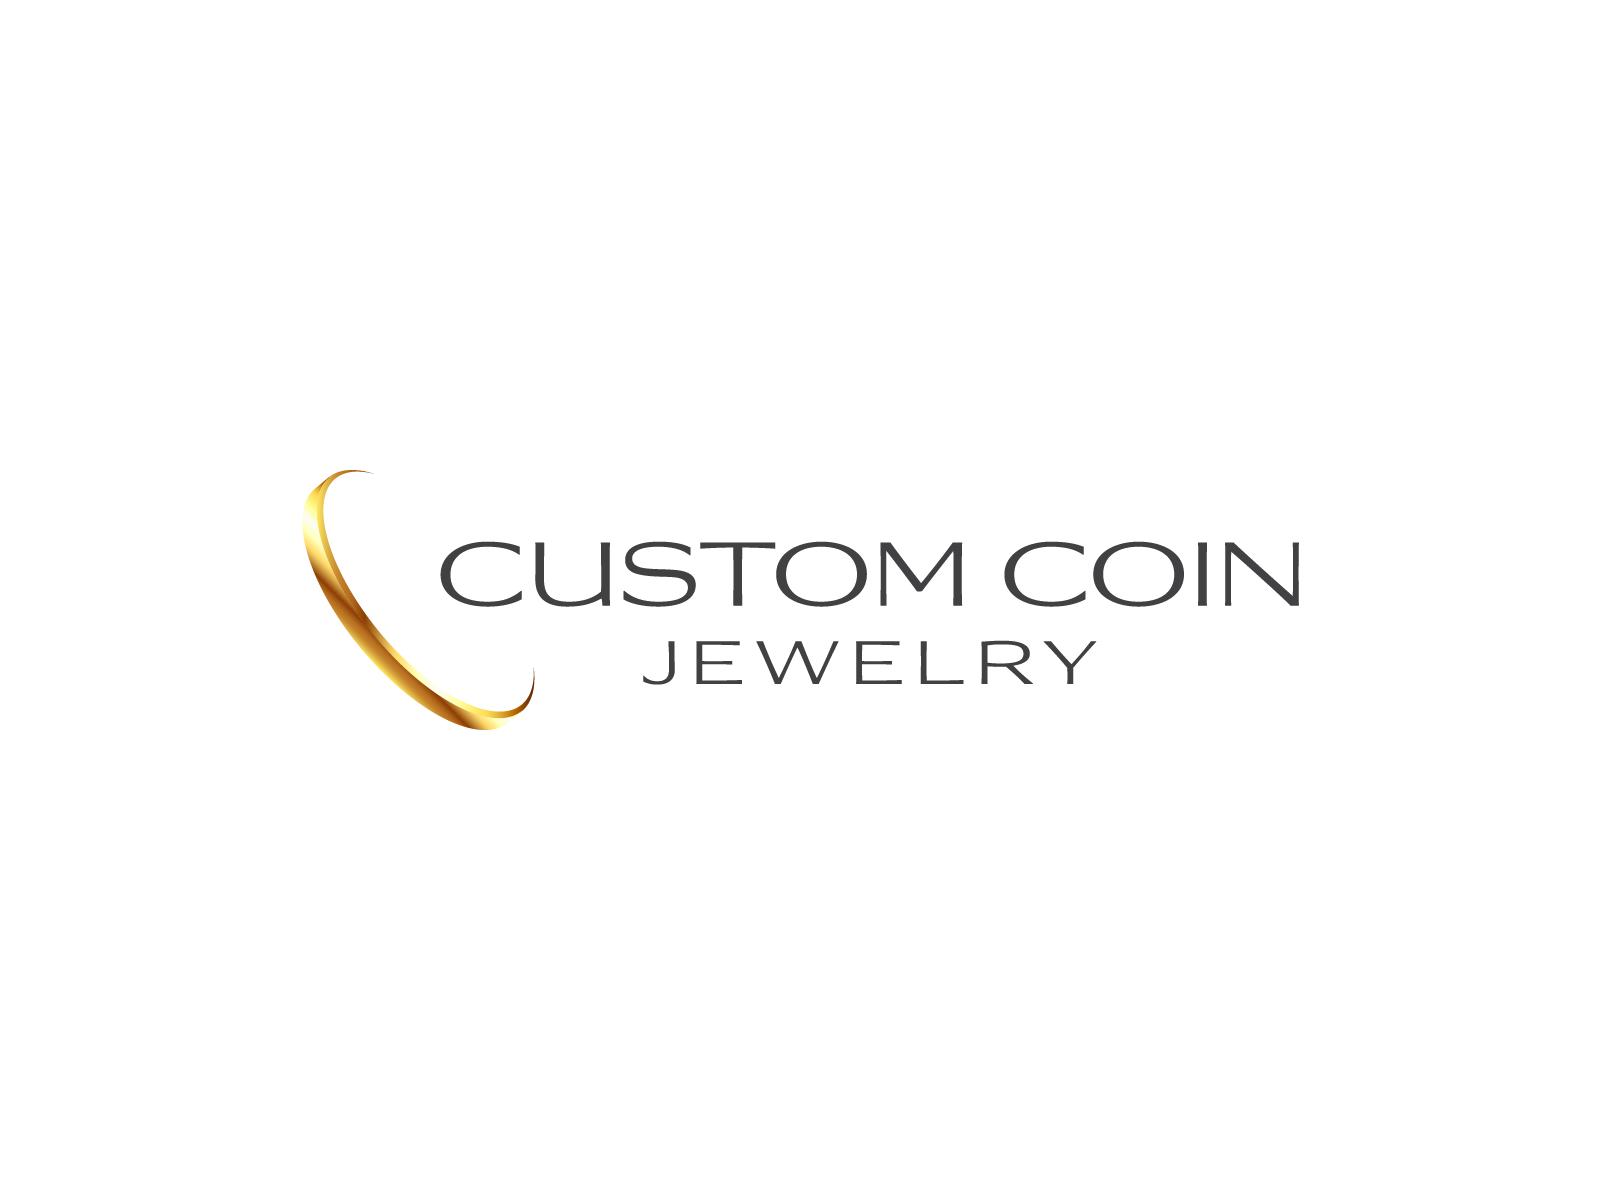 Custom Coin Jewelry needs a new logo